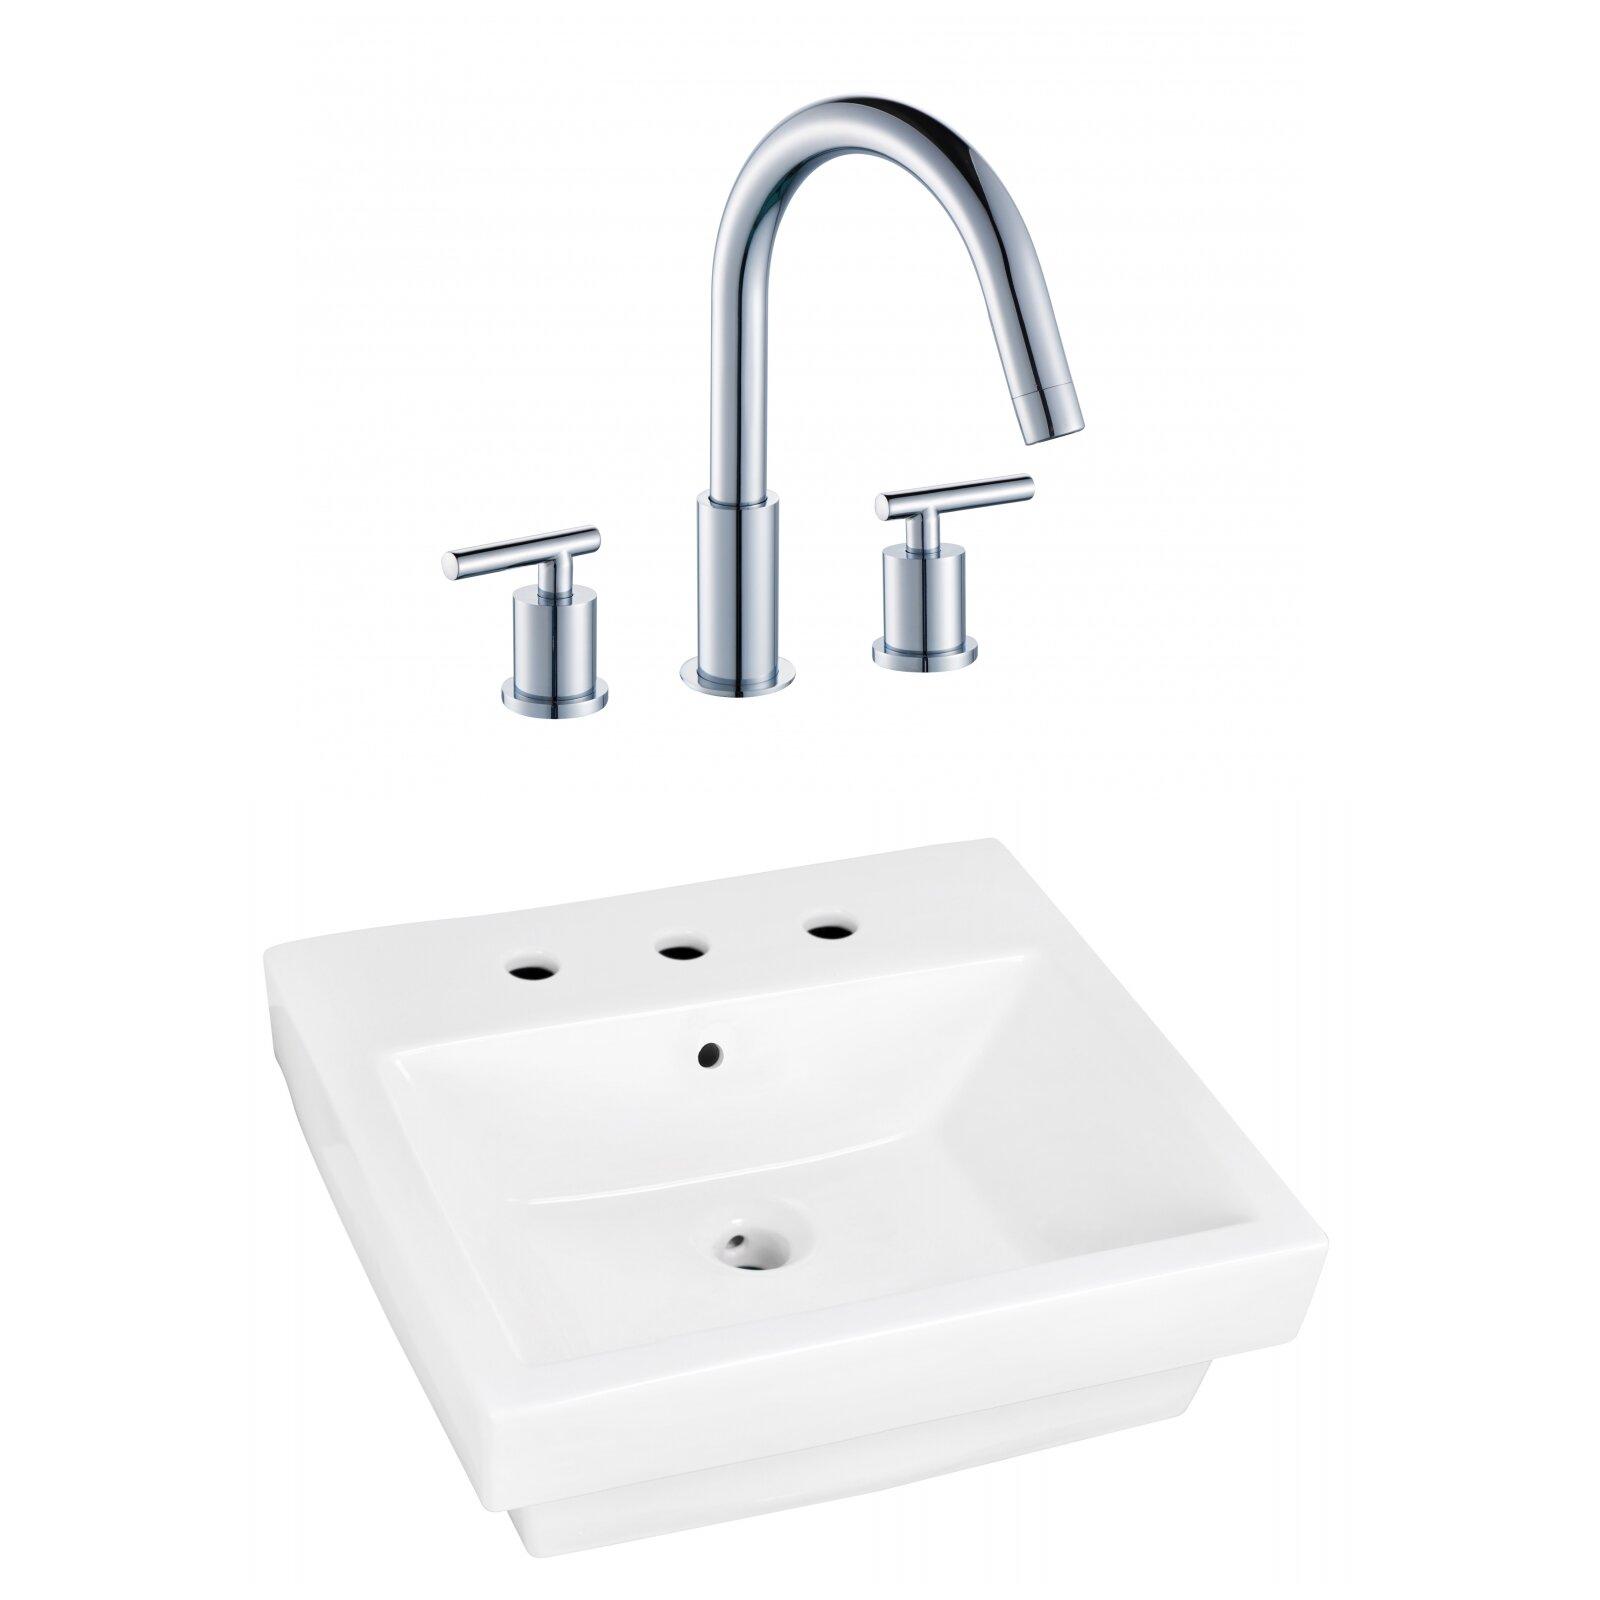 Royalpurplebathkitchen Above Counter Ceramic Rectangular Vessel Bathroom Sink With Faucet And Overflow Wayfair